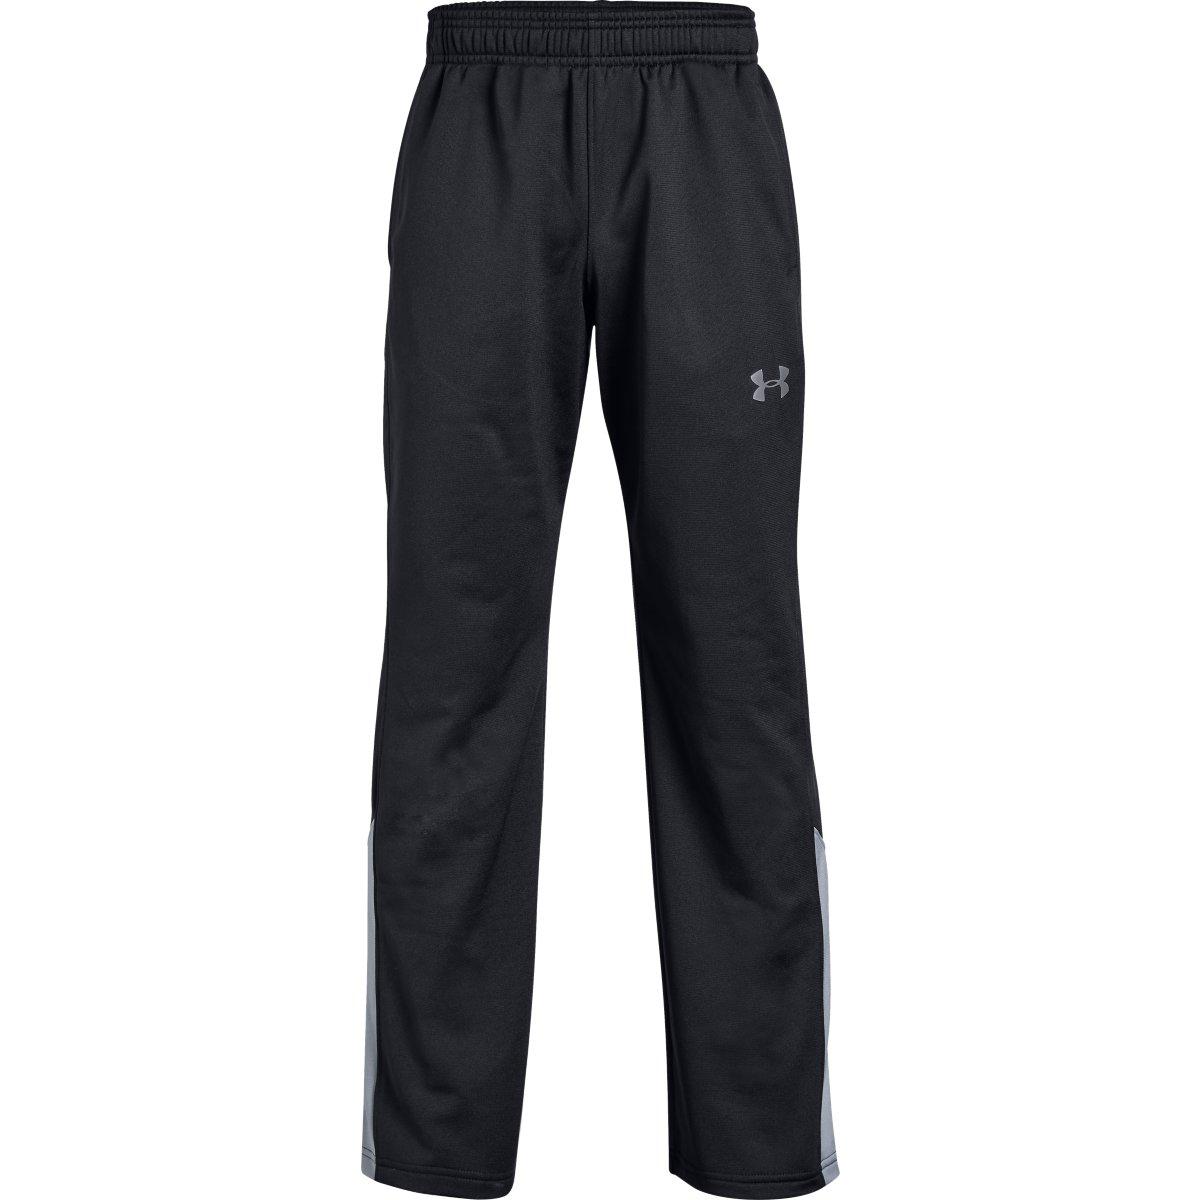 Under Armour Big Boys' Ua Brawler 2.0 Pants - Black, M